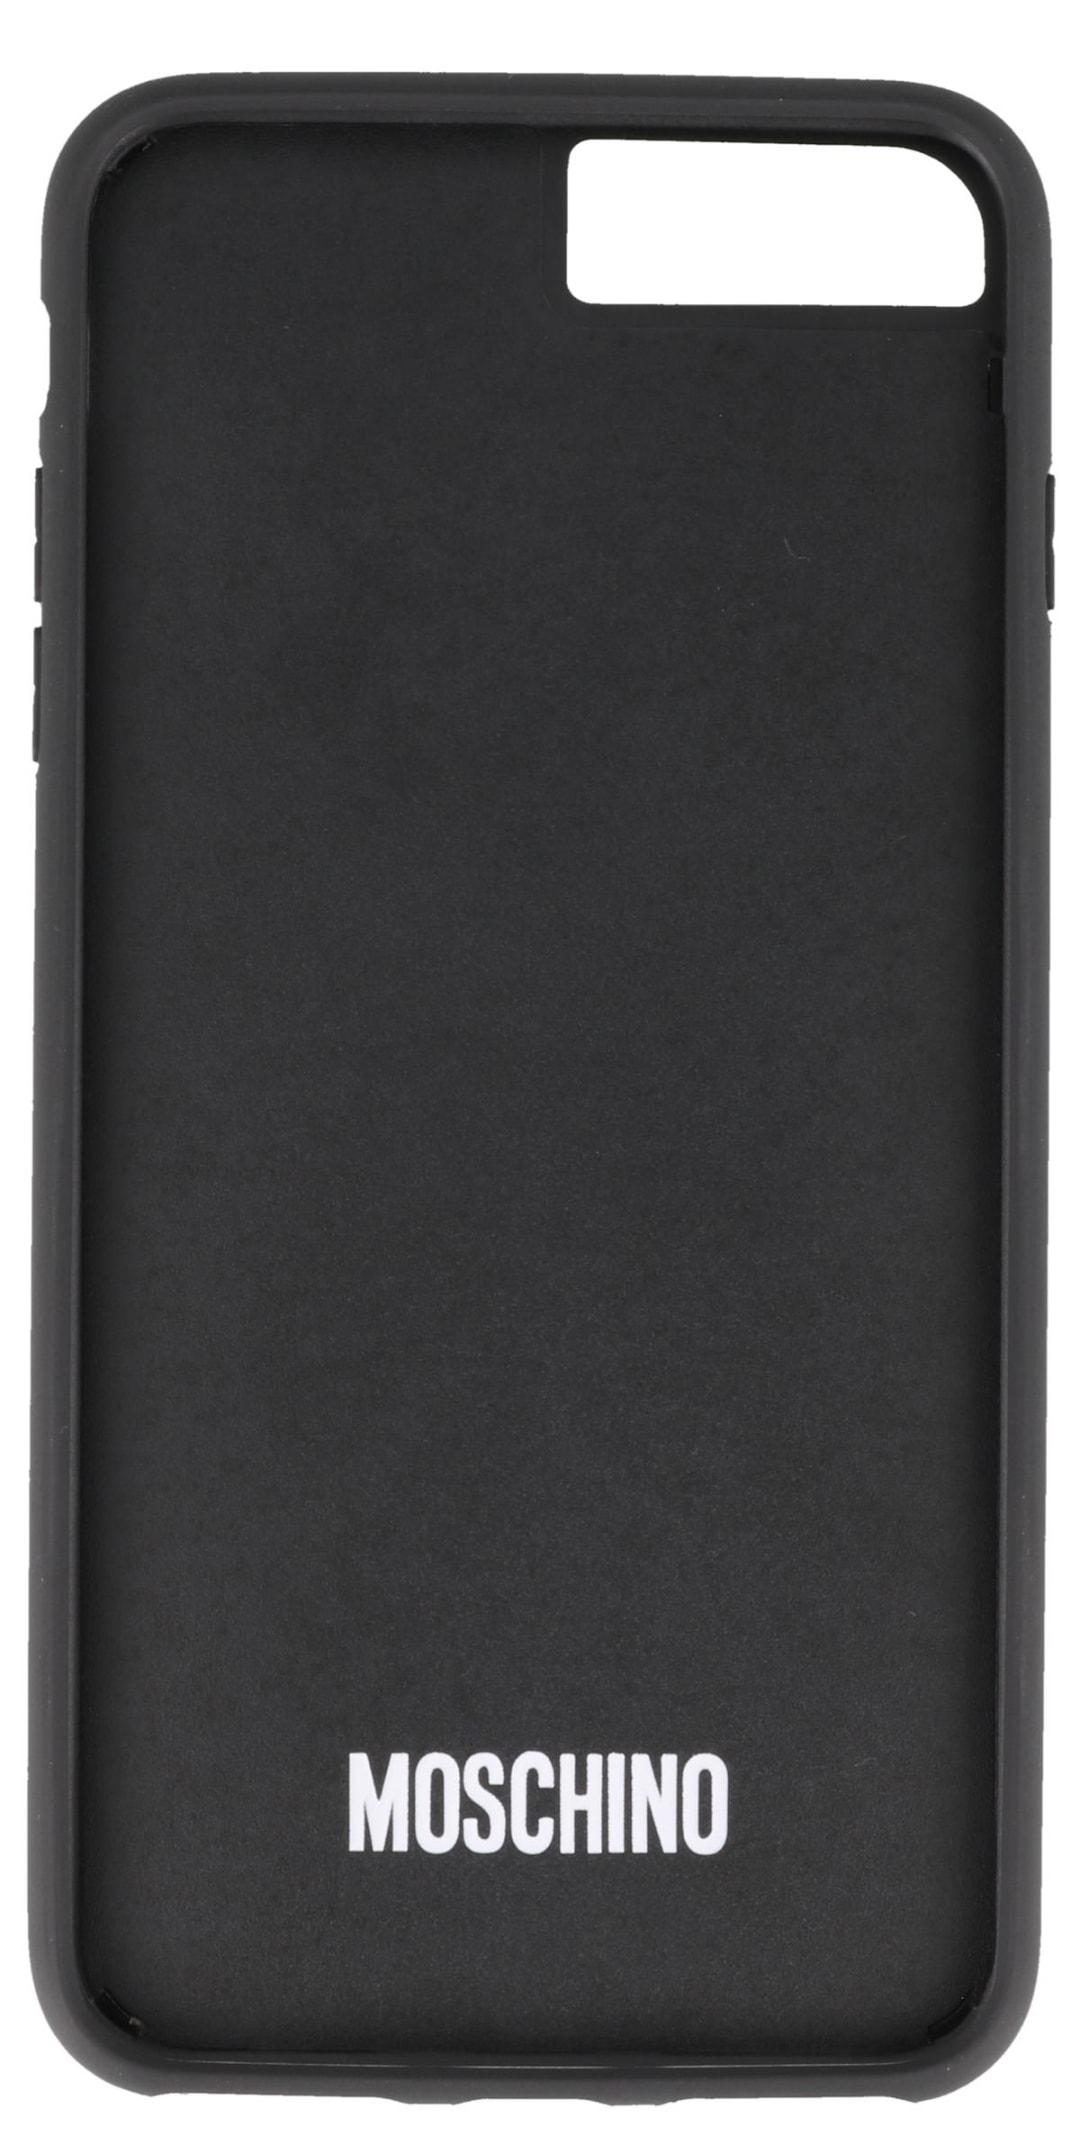 moschino case iphone 7